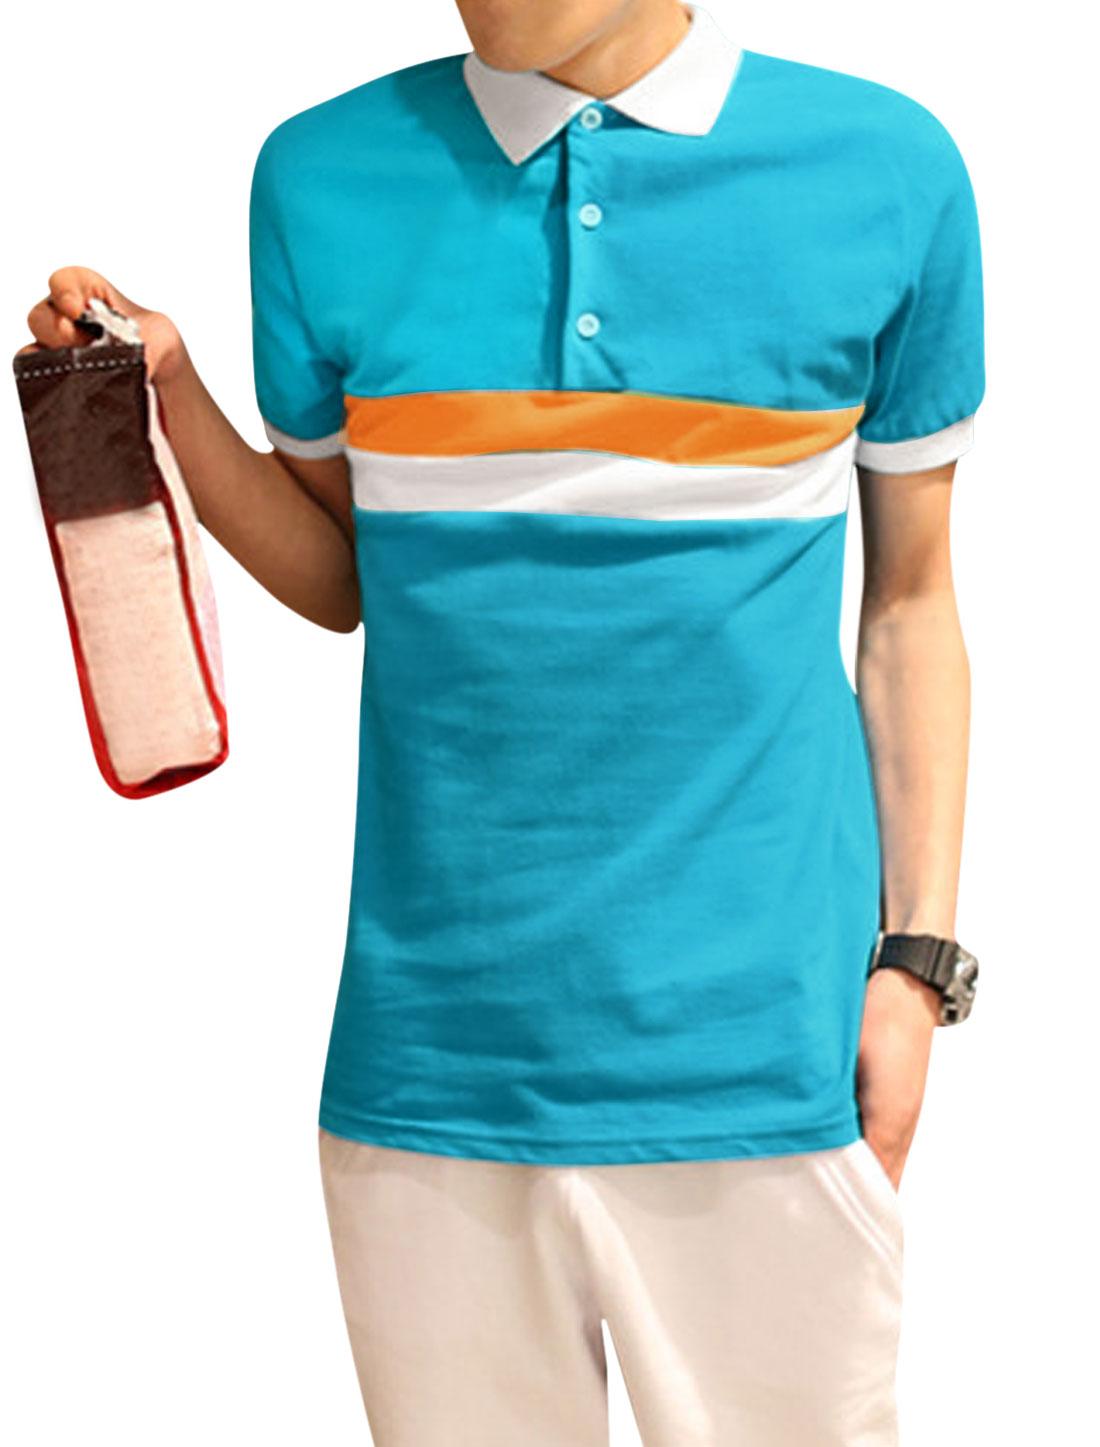 Man Color Block Stripes Design Button Closed Upper Polo Shirt Blue Orange M